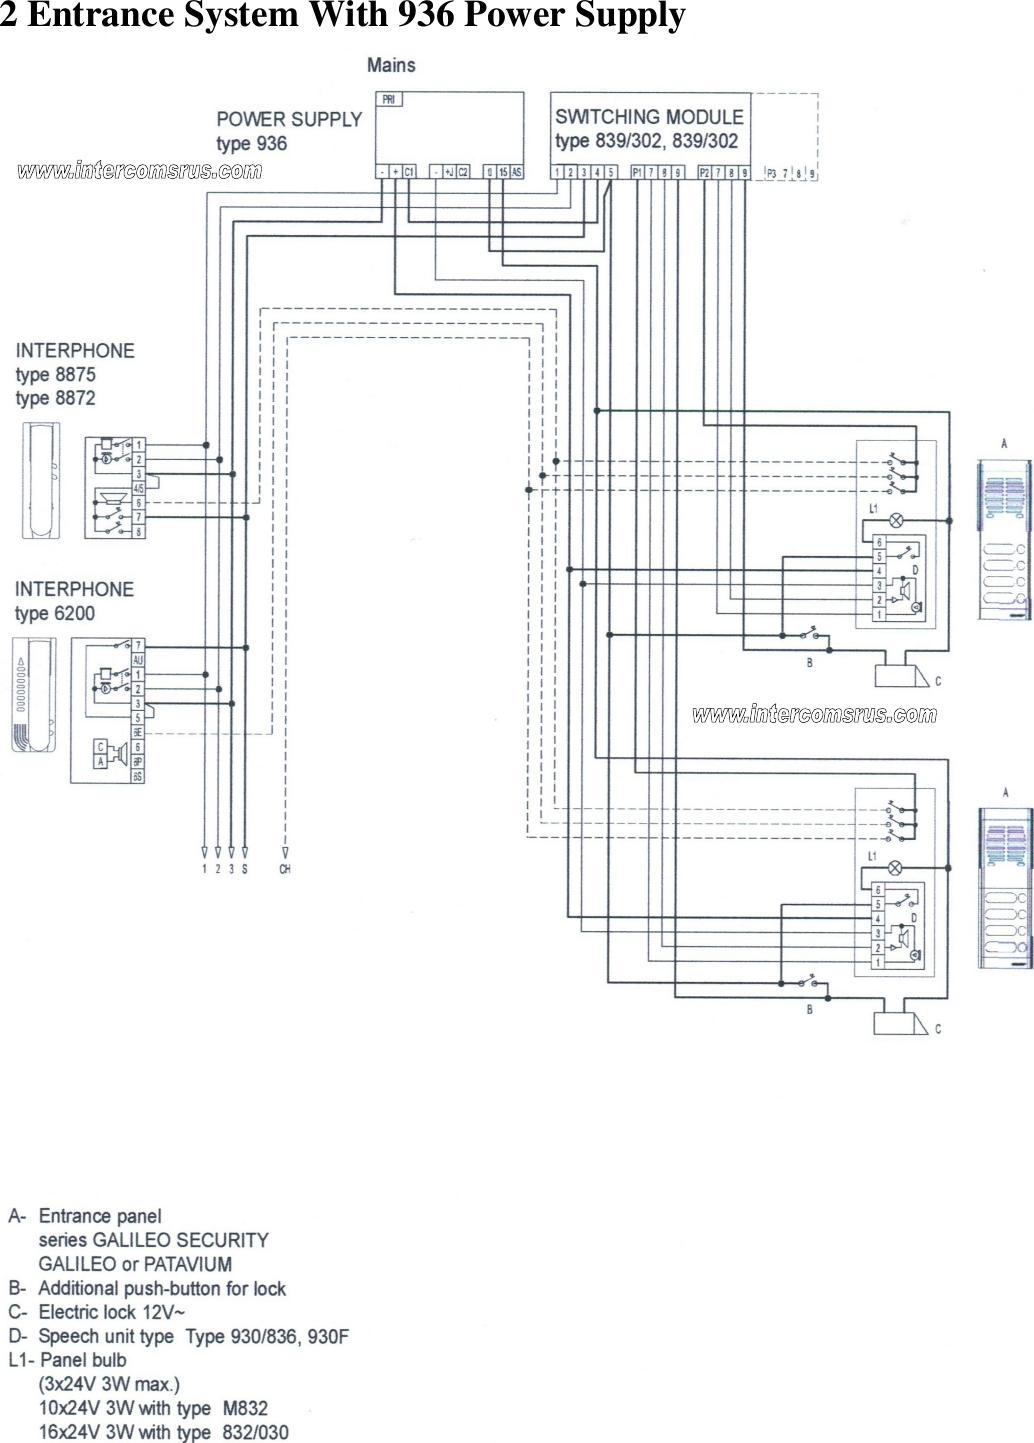 Pleasing Elvox 6200 Intercom Handset Data Sheet Elvox6200 Wiring Digital Resources Honesemecshebarightsorg